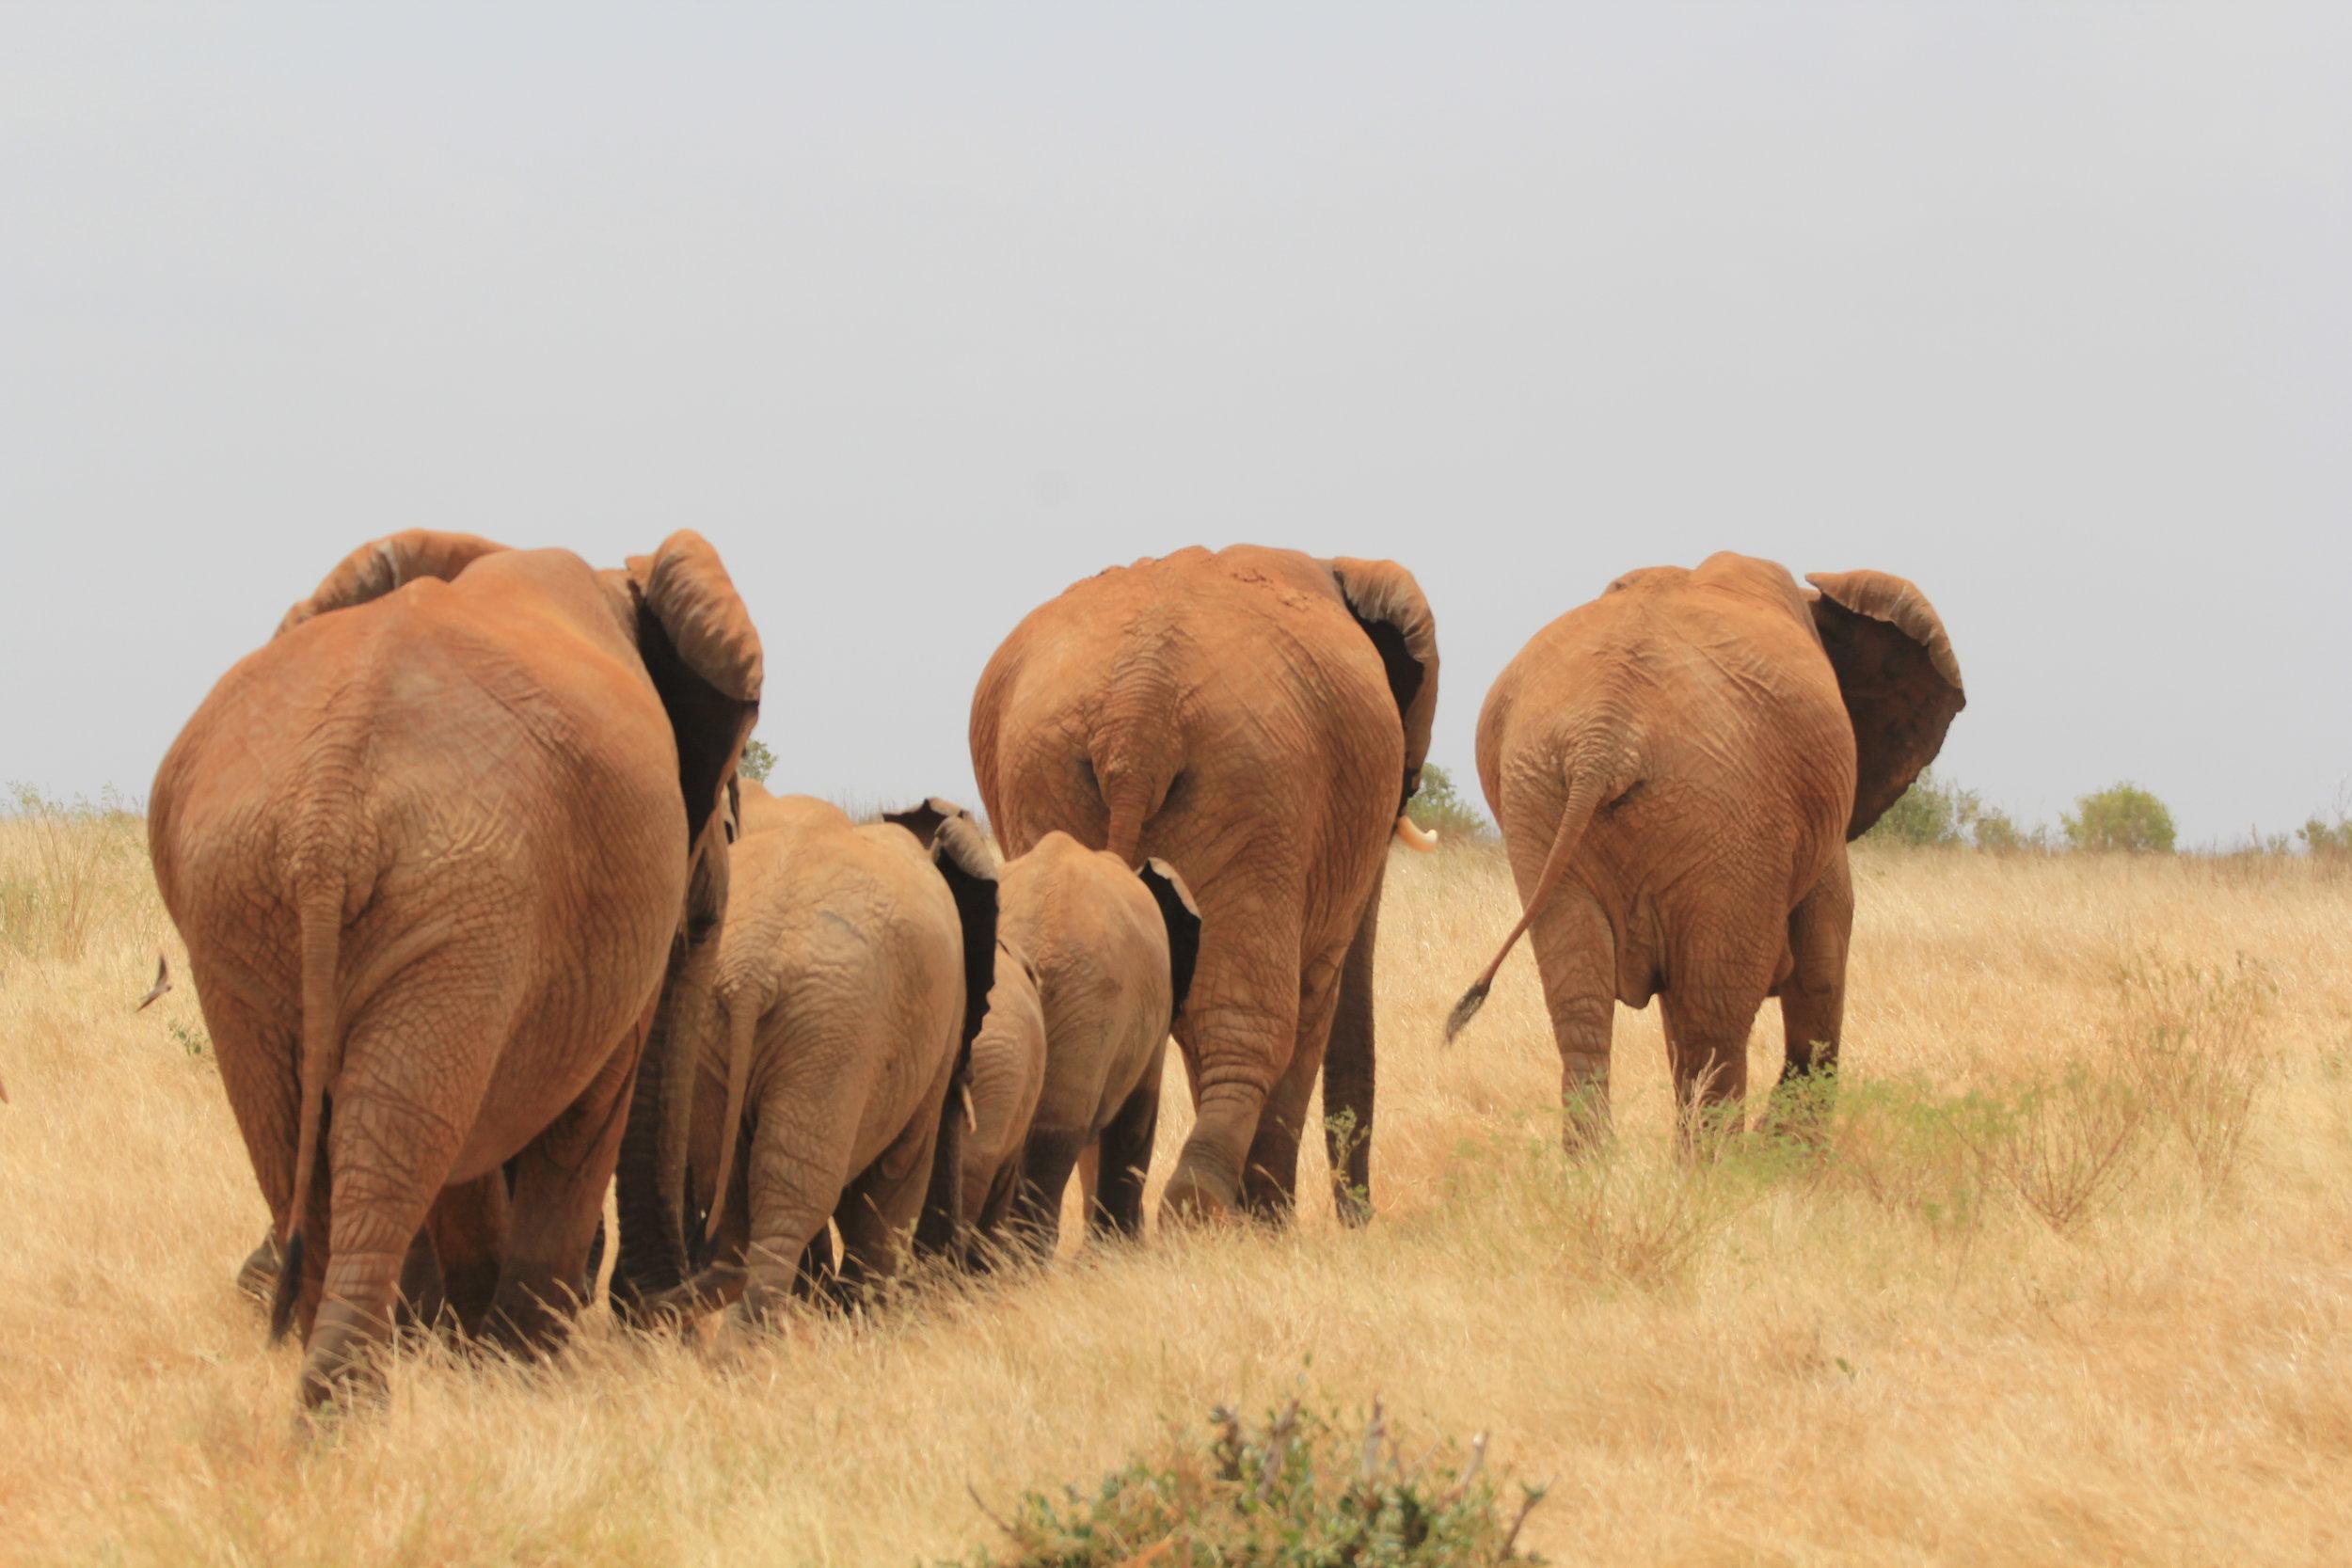 elephants in Kenya safari